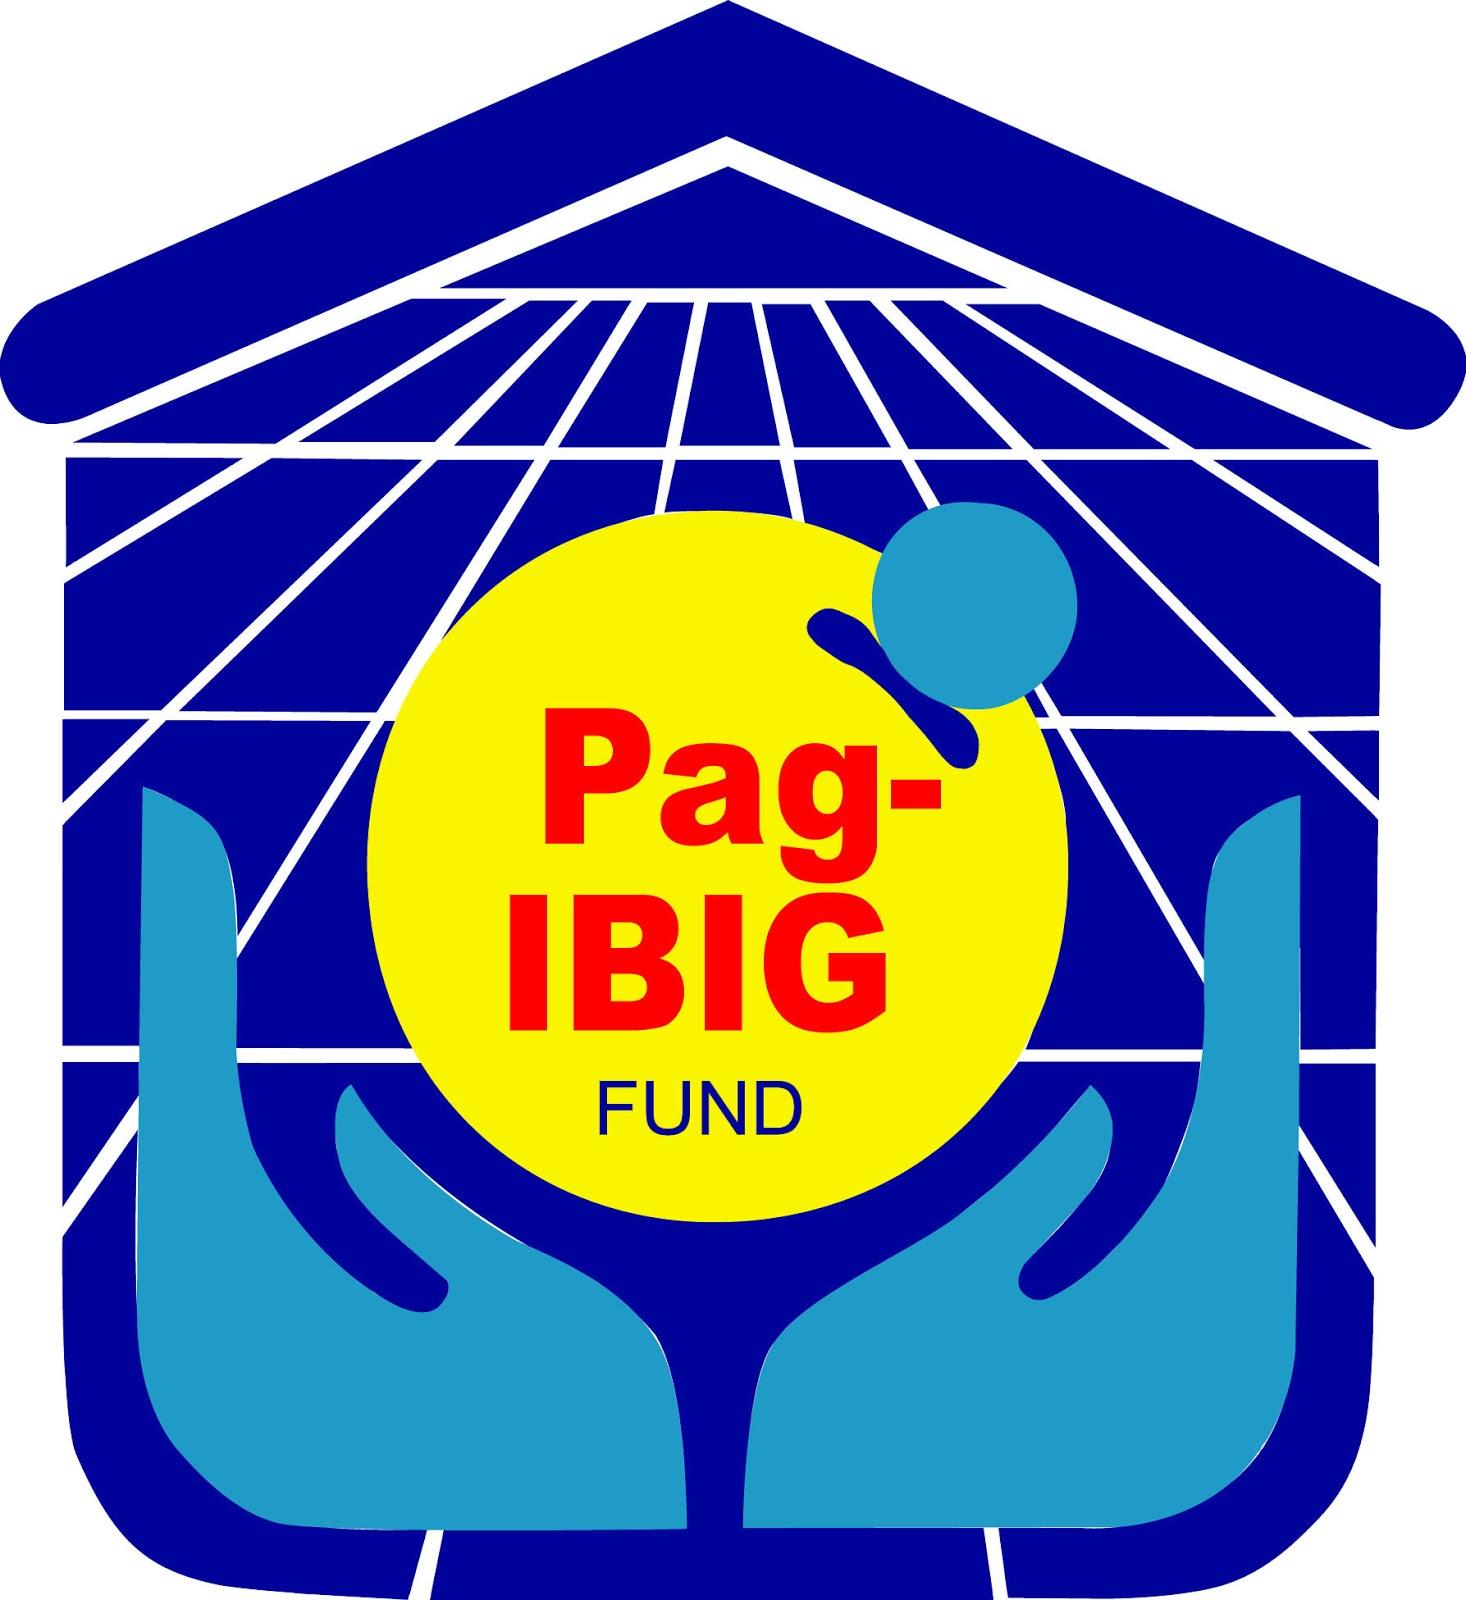 Loan Form Pag Ibig Calamity